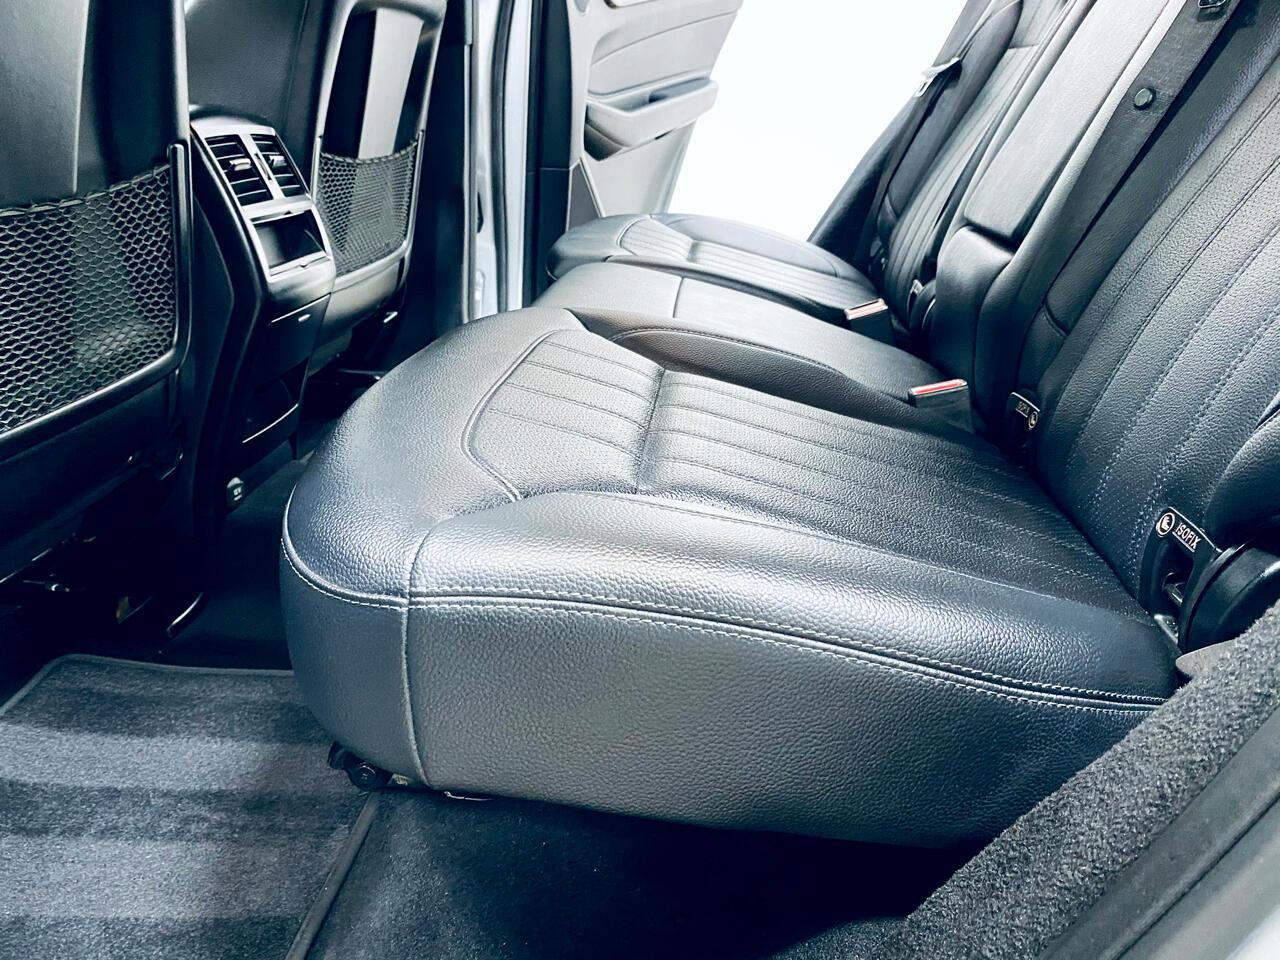 2017 Mercedes-Benz GL-Class (CC-1411580) for sale in Mooresville, North Carolina